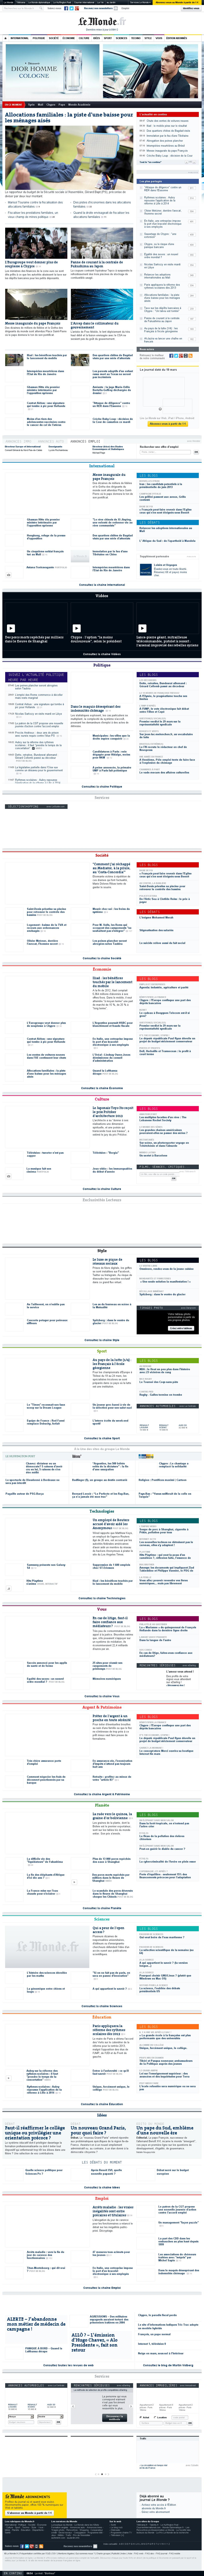 Le Monde at Tuesday March 19, 2013, 8:14 a.m. UTC